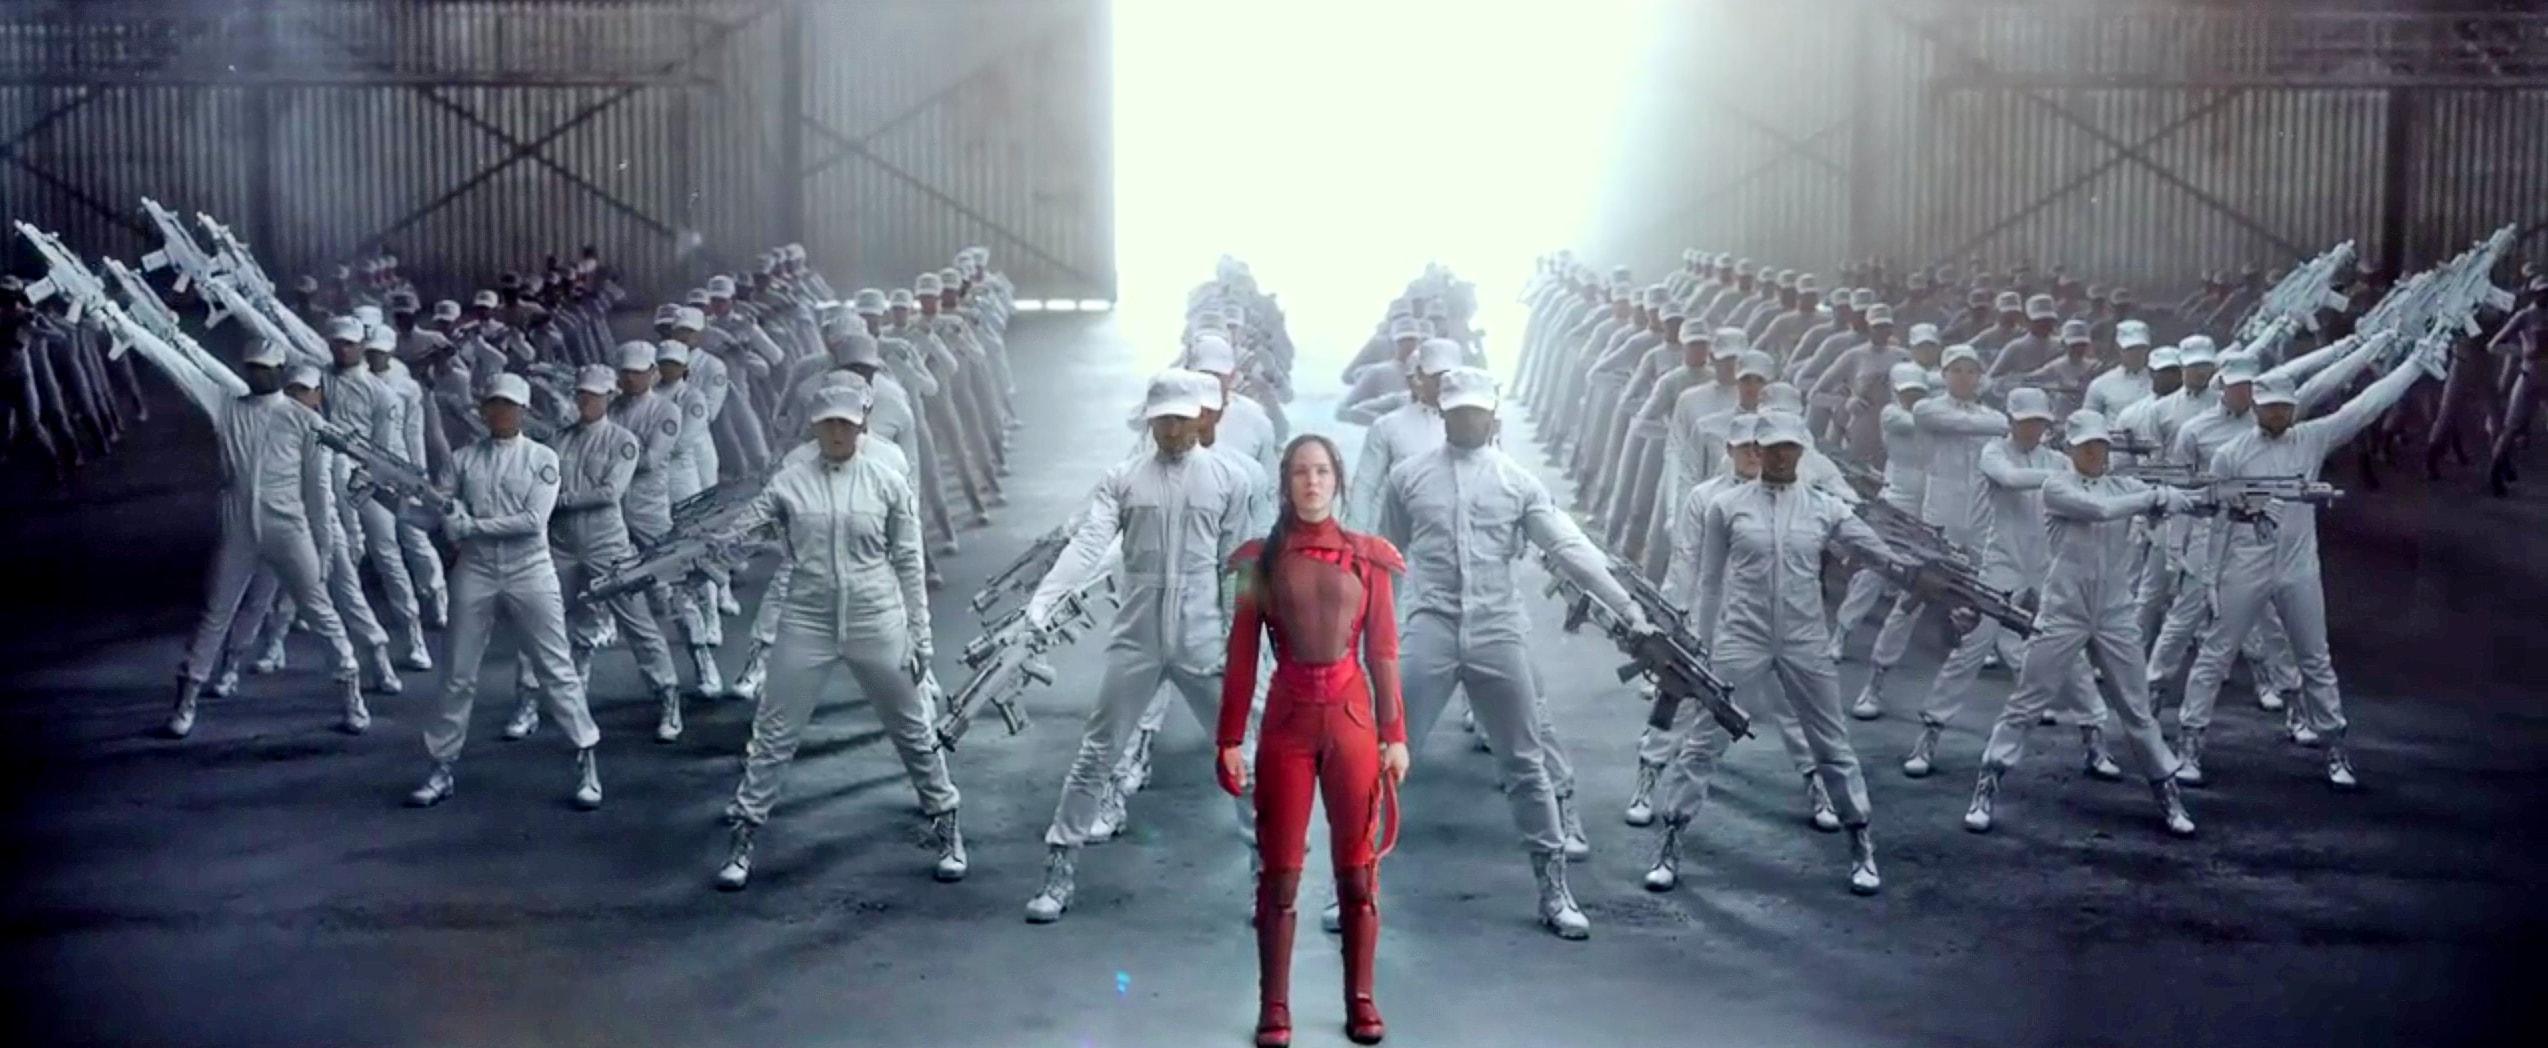 The Hunger Games: Mockingjay - Part 2 Desktop wallpaper